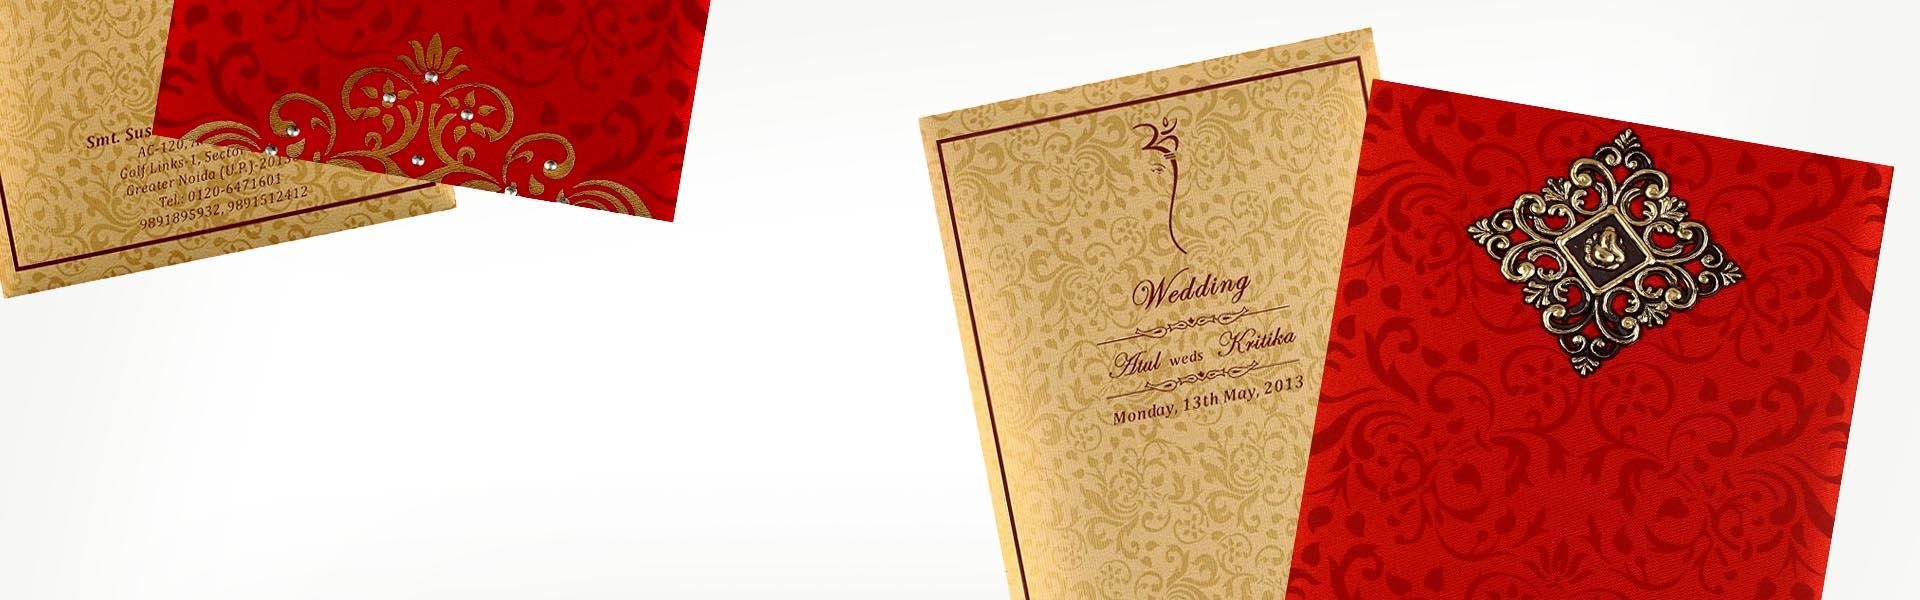 Paras Traders | Bharuch, Gujarat, INDIA - Invitation Card, Wedding ...